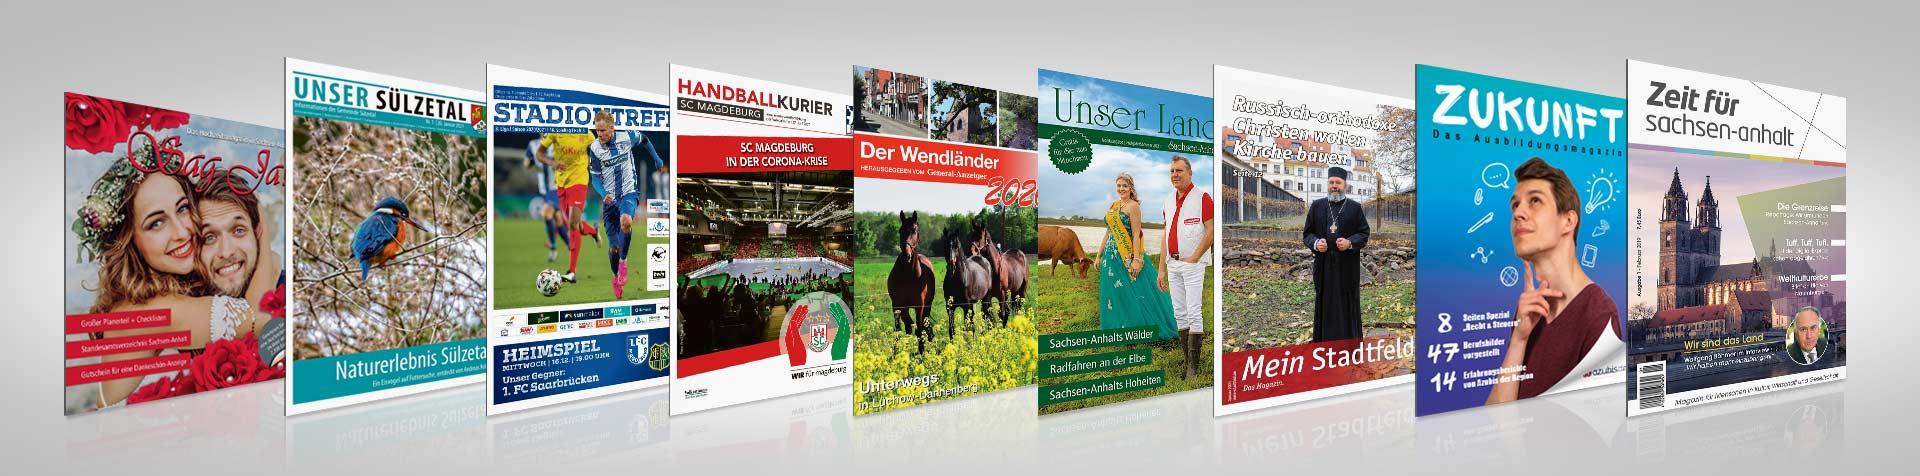 Magazine der Mediengruppe Magdeburg